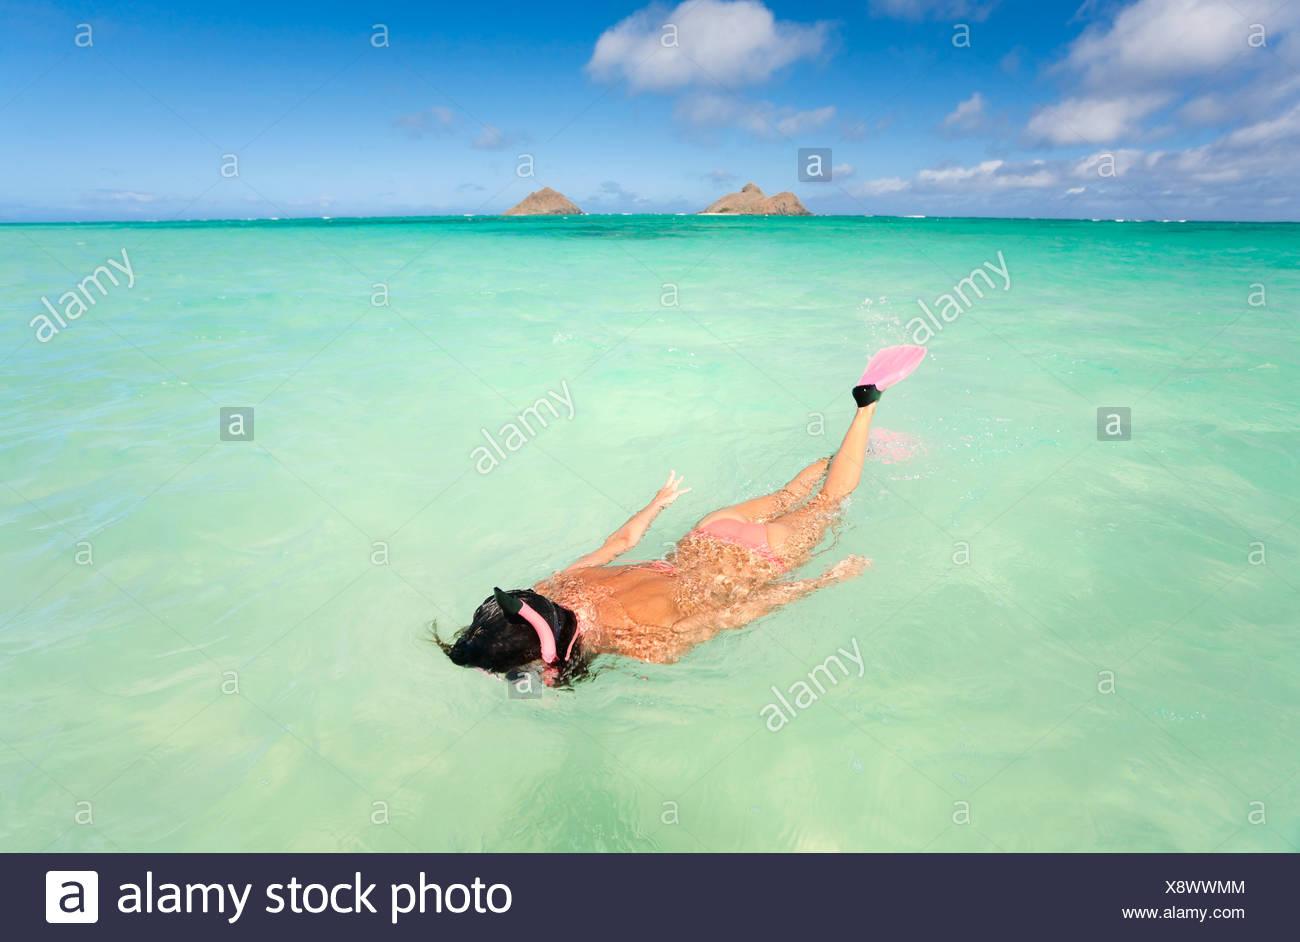 Hawaii Oahu Lanikai Beach Woman Snorkeling In Turquoise